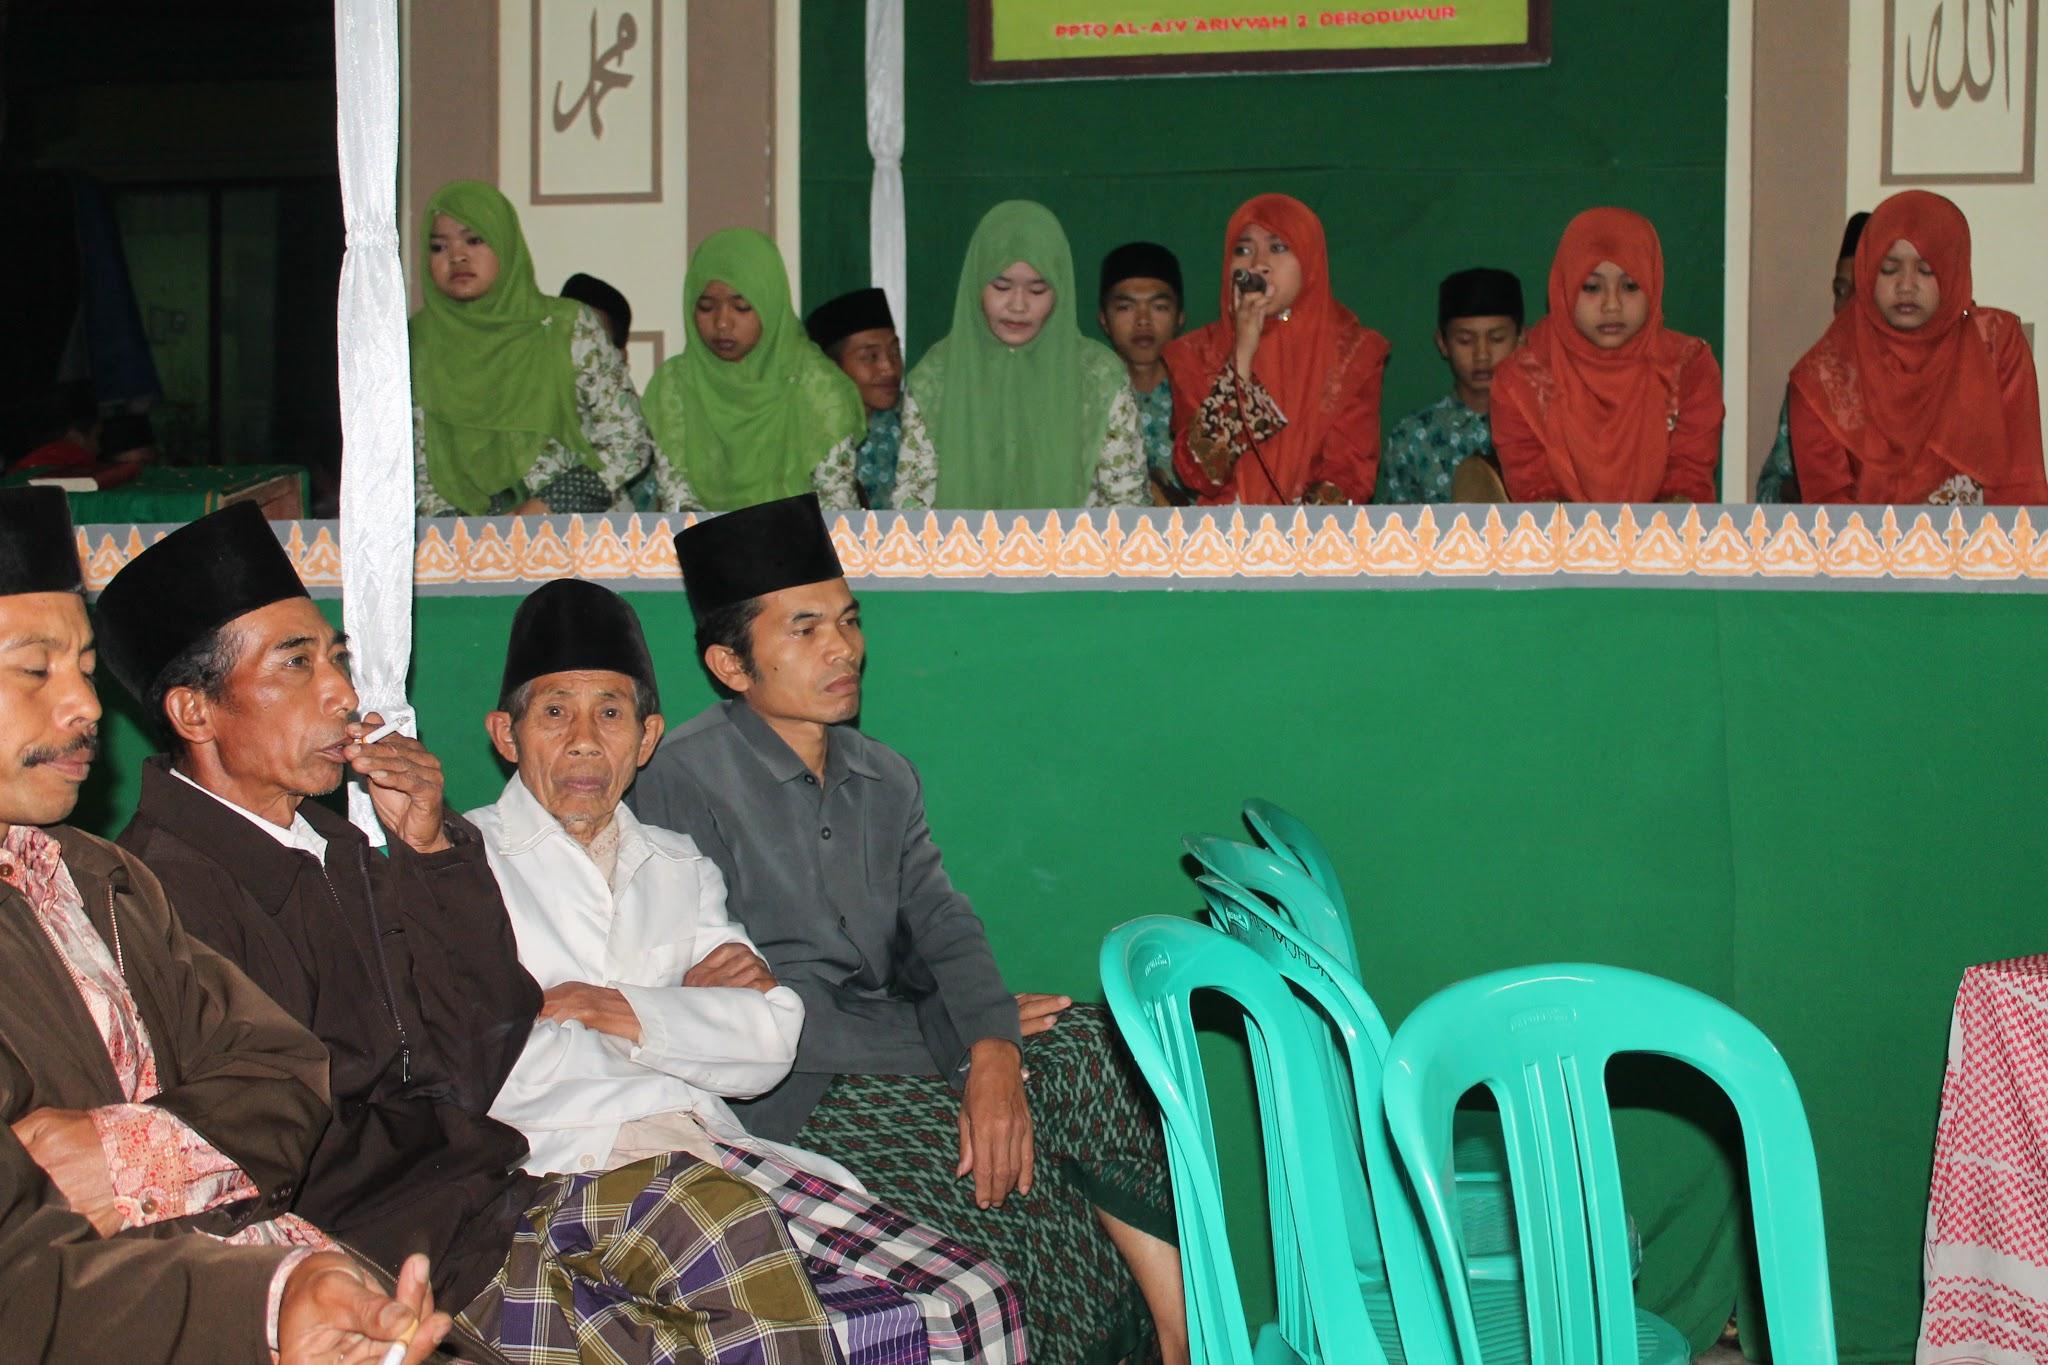 Macam-Macam Peringatan Hari Besar Islam dan Penjelasannya